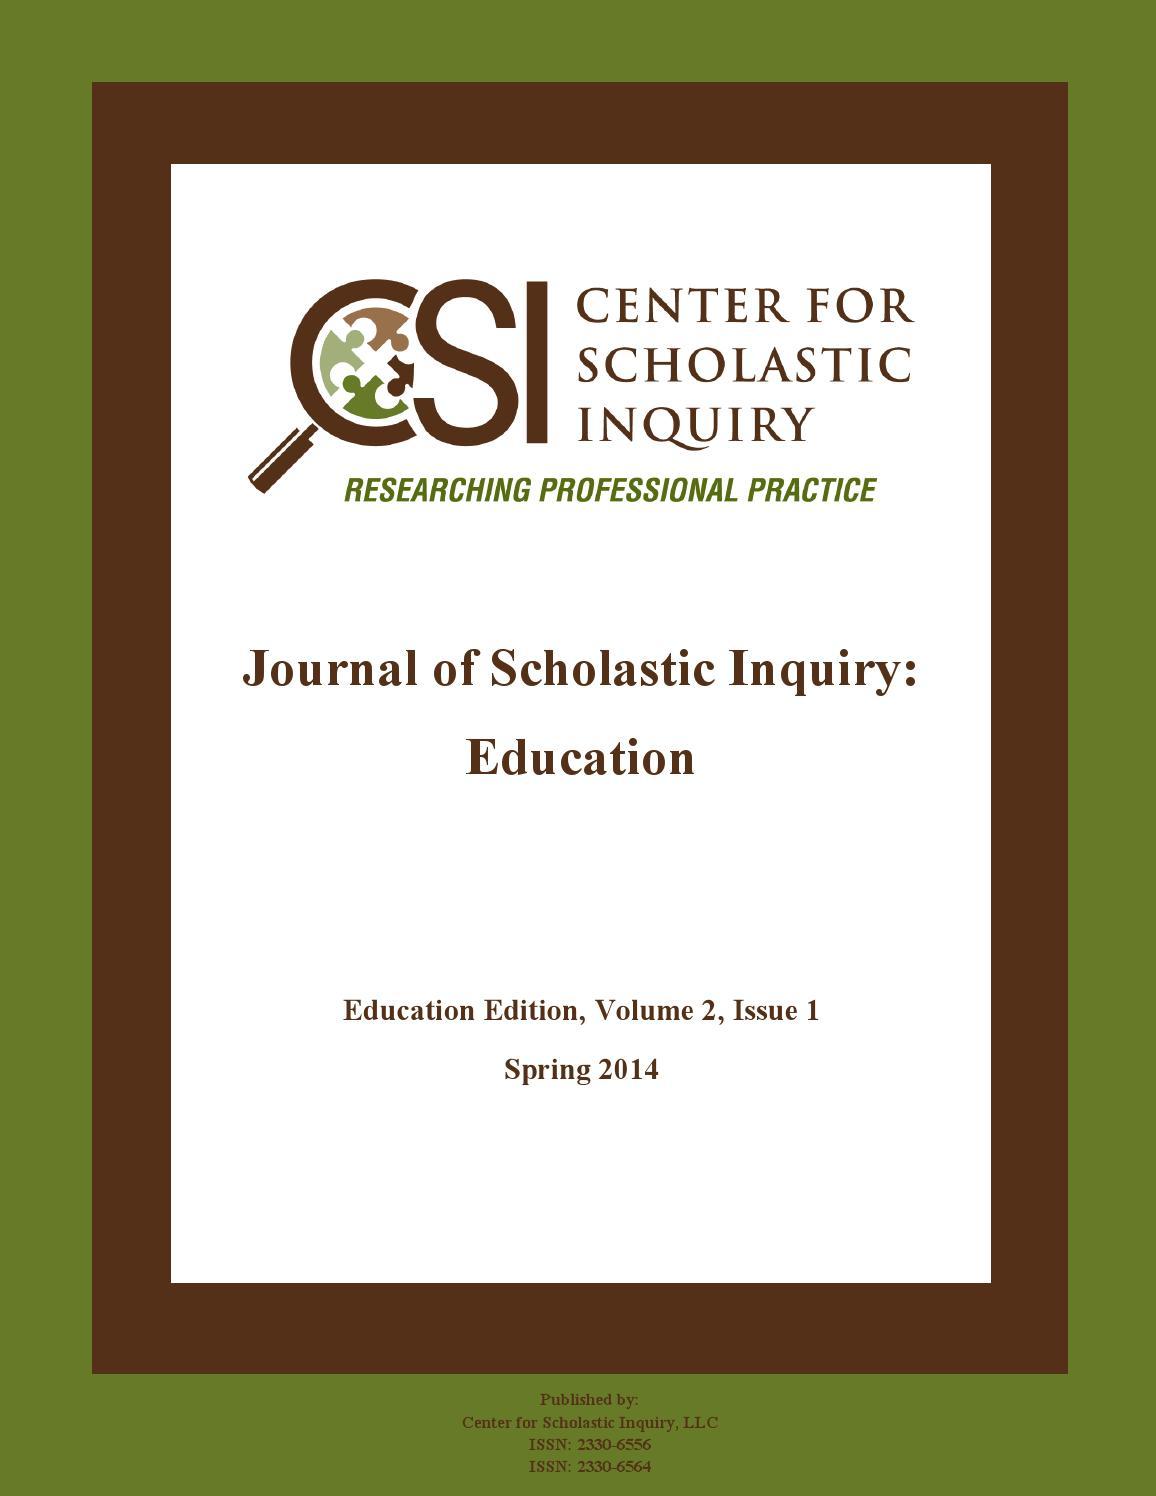 Papers quantitative and qualitative research methods